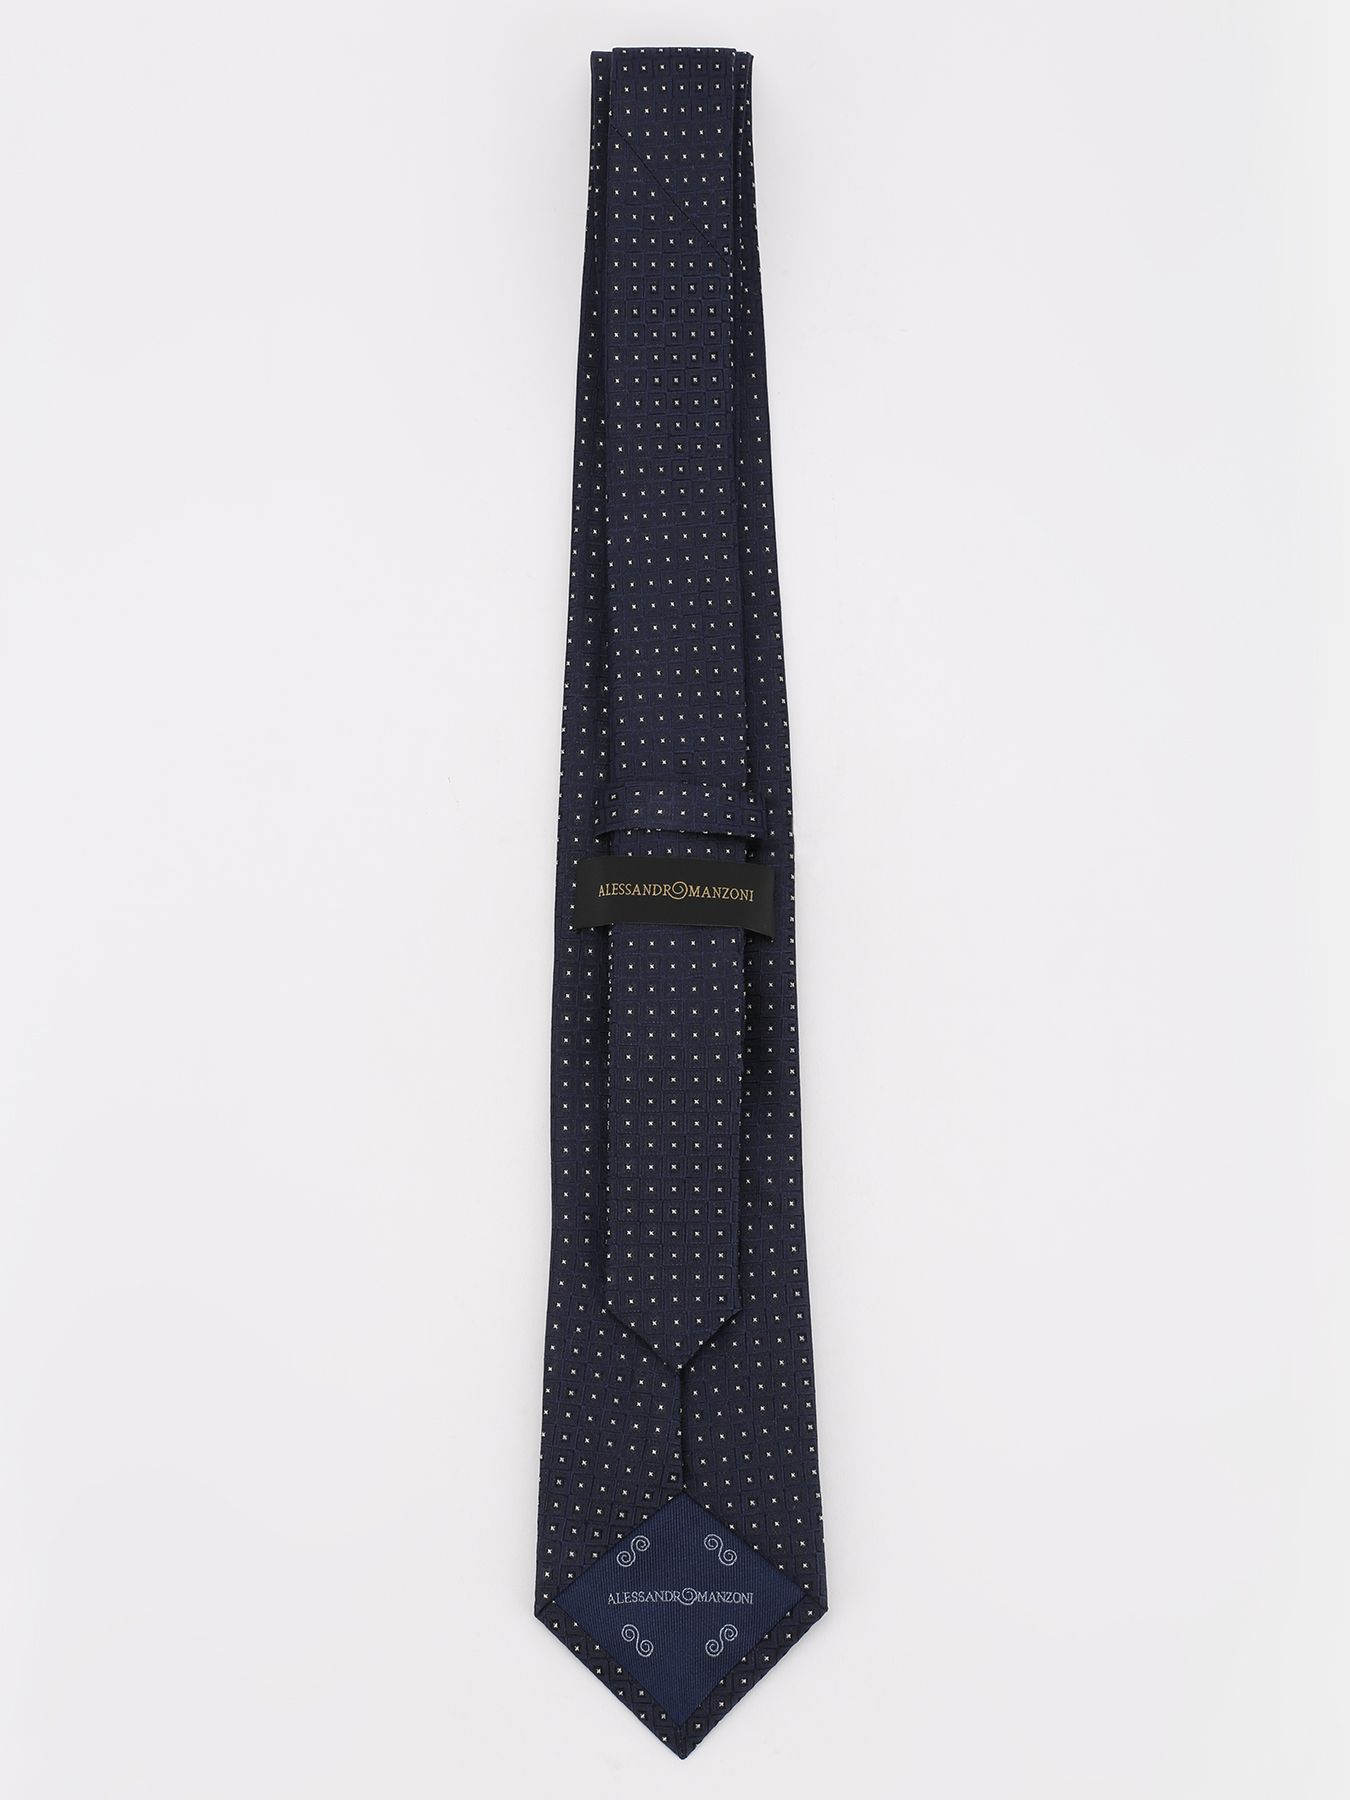 Alessandro Manzoni Шелковый галстук с узорами 324190-185 Фото 2